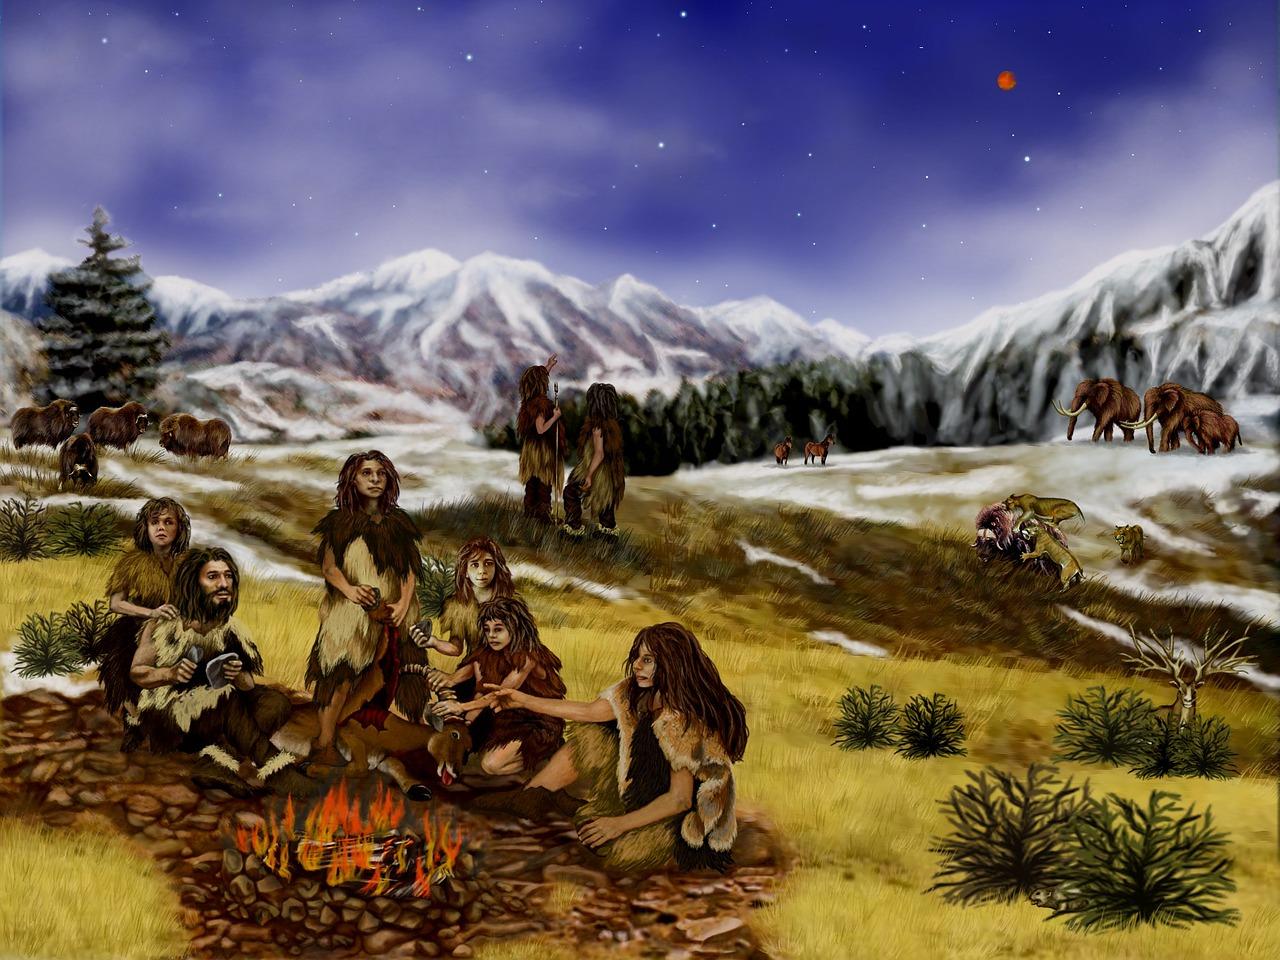 Interbreeding with Neanderthal helped humans survive flu and hepatitis